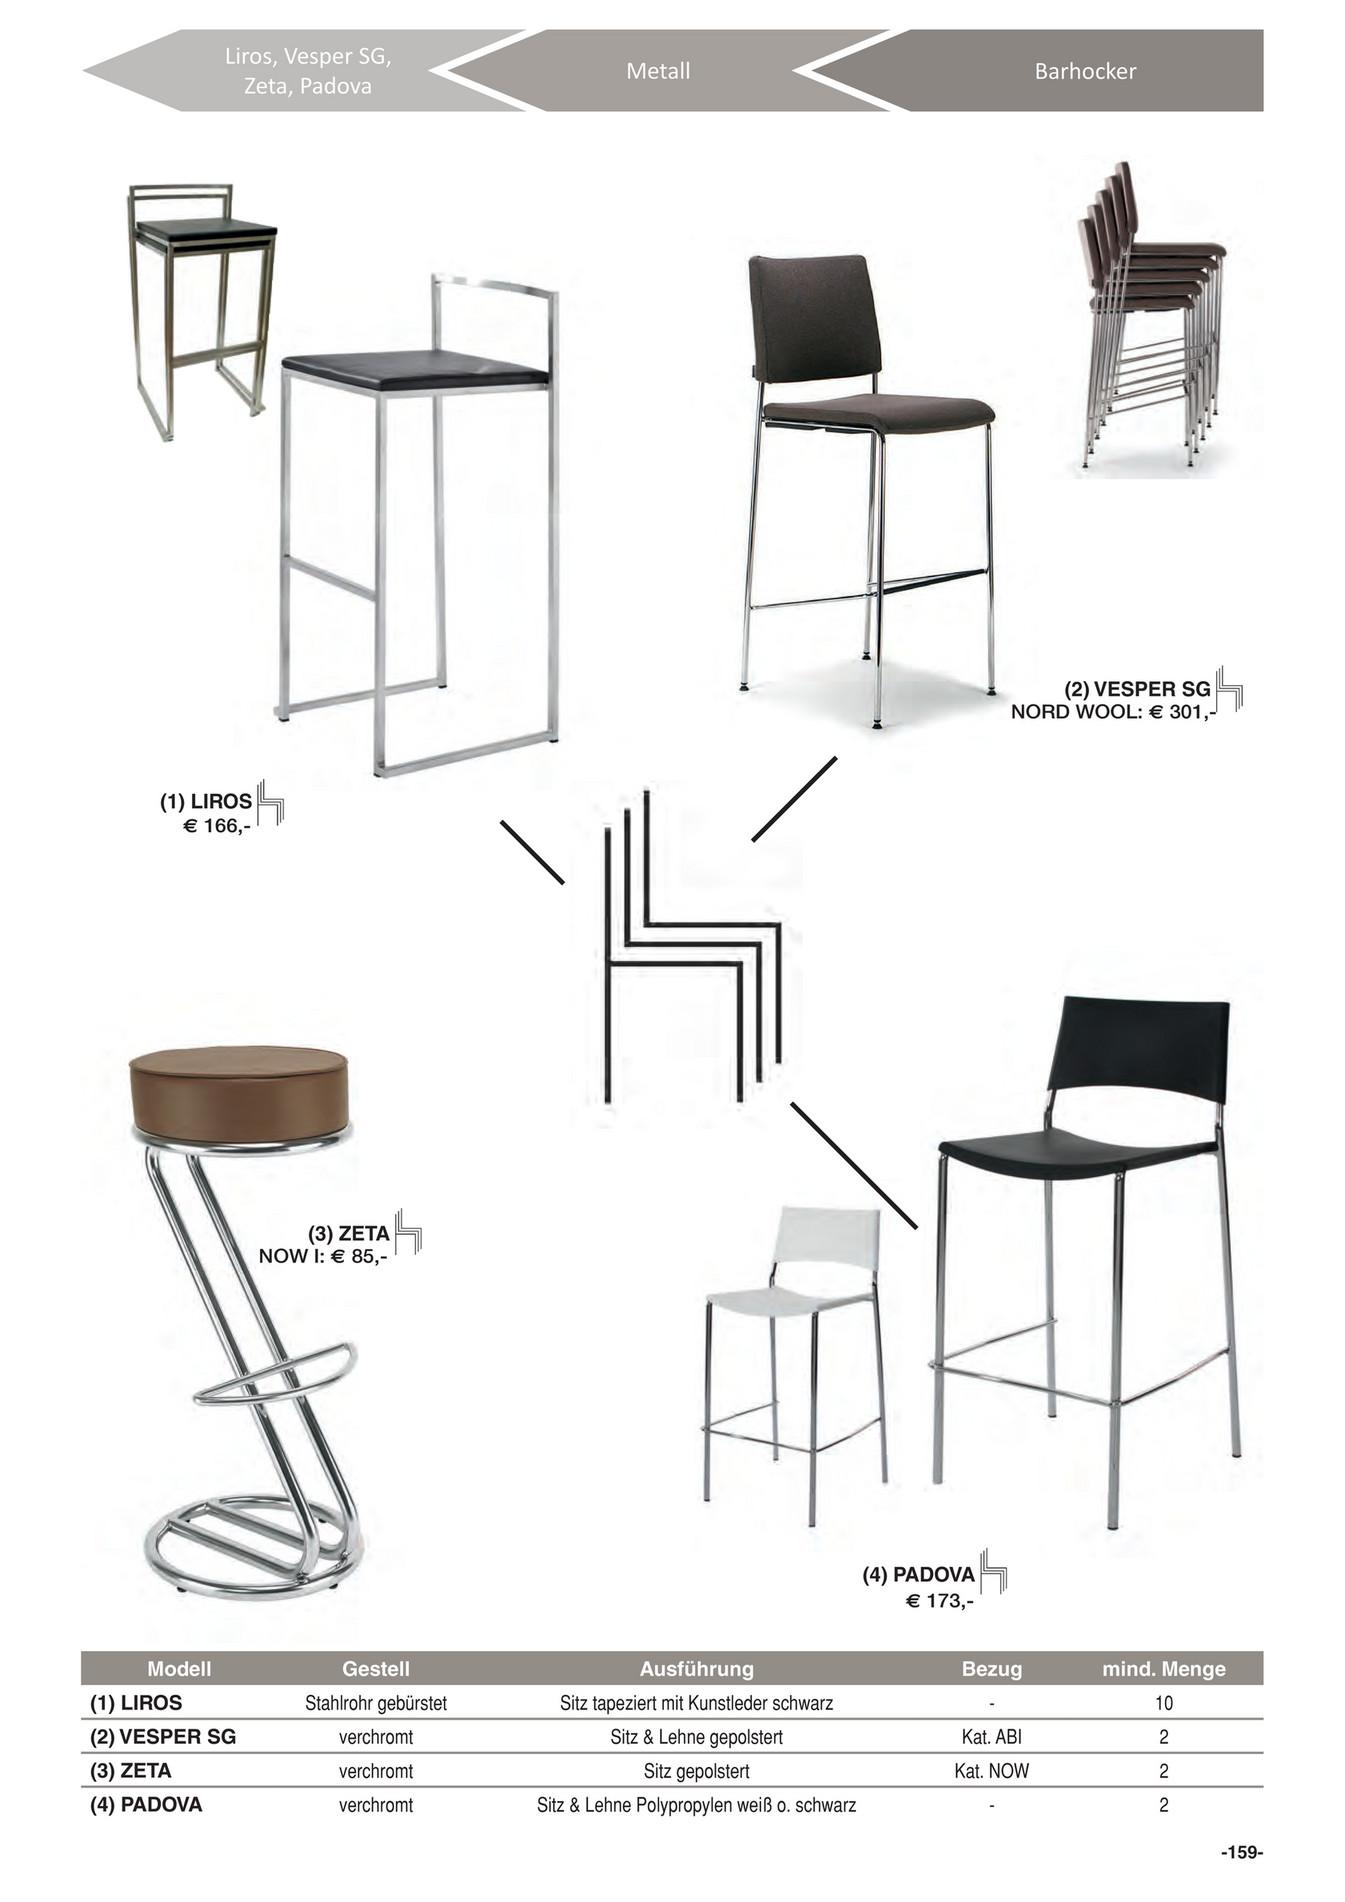 metro sterreich gastronomie gastronomie m bel 2016. Black Bedroom Furniture Sets. Home Design Ideas